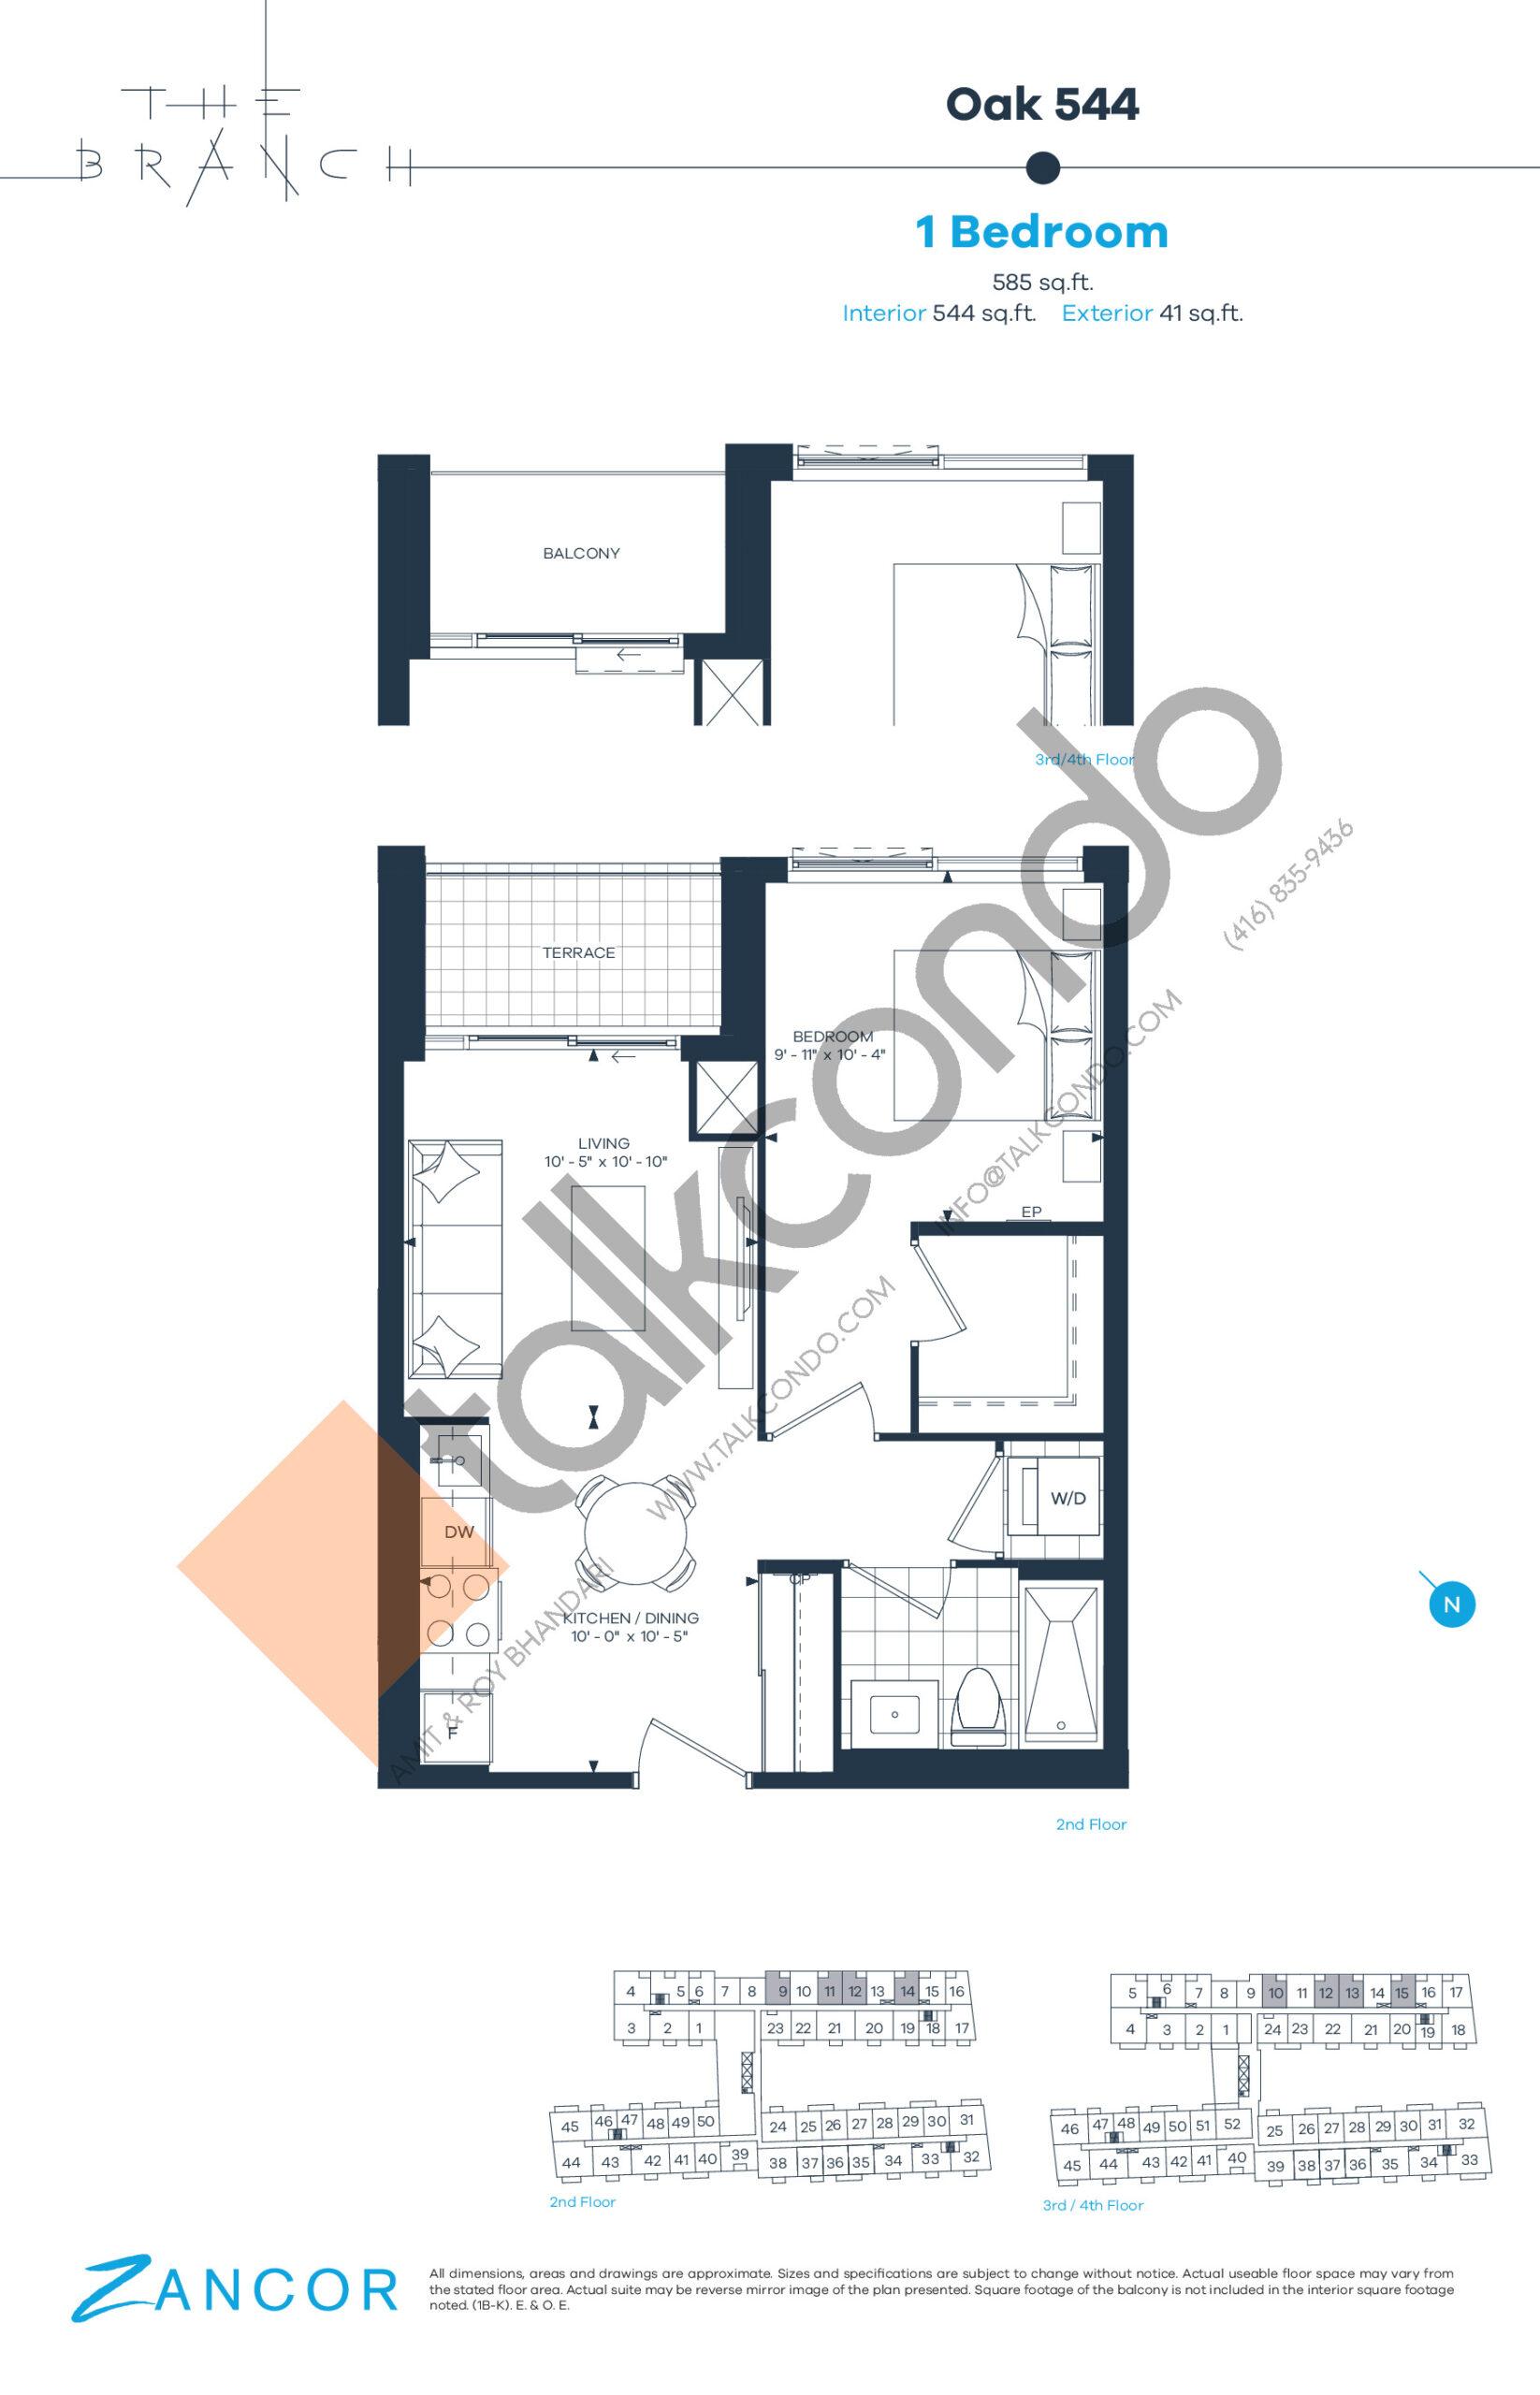 Oak 544 Floor Plan at The Branch Condos - 544 sq.ft